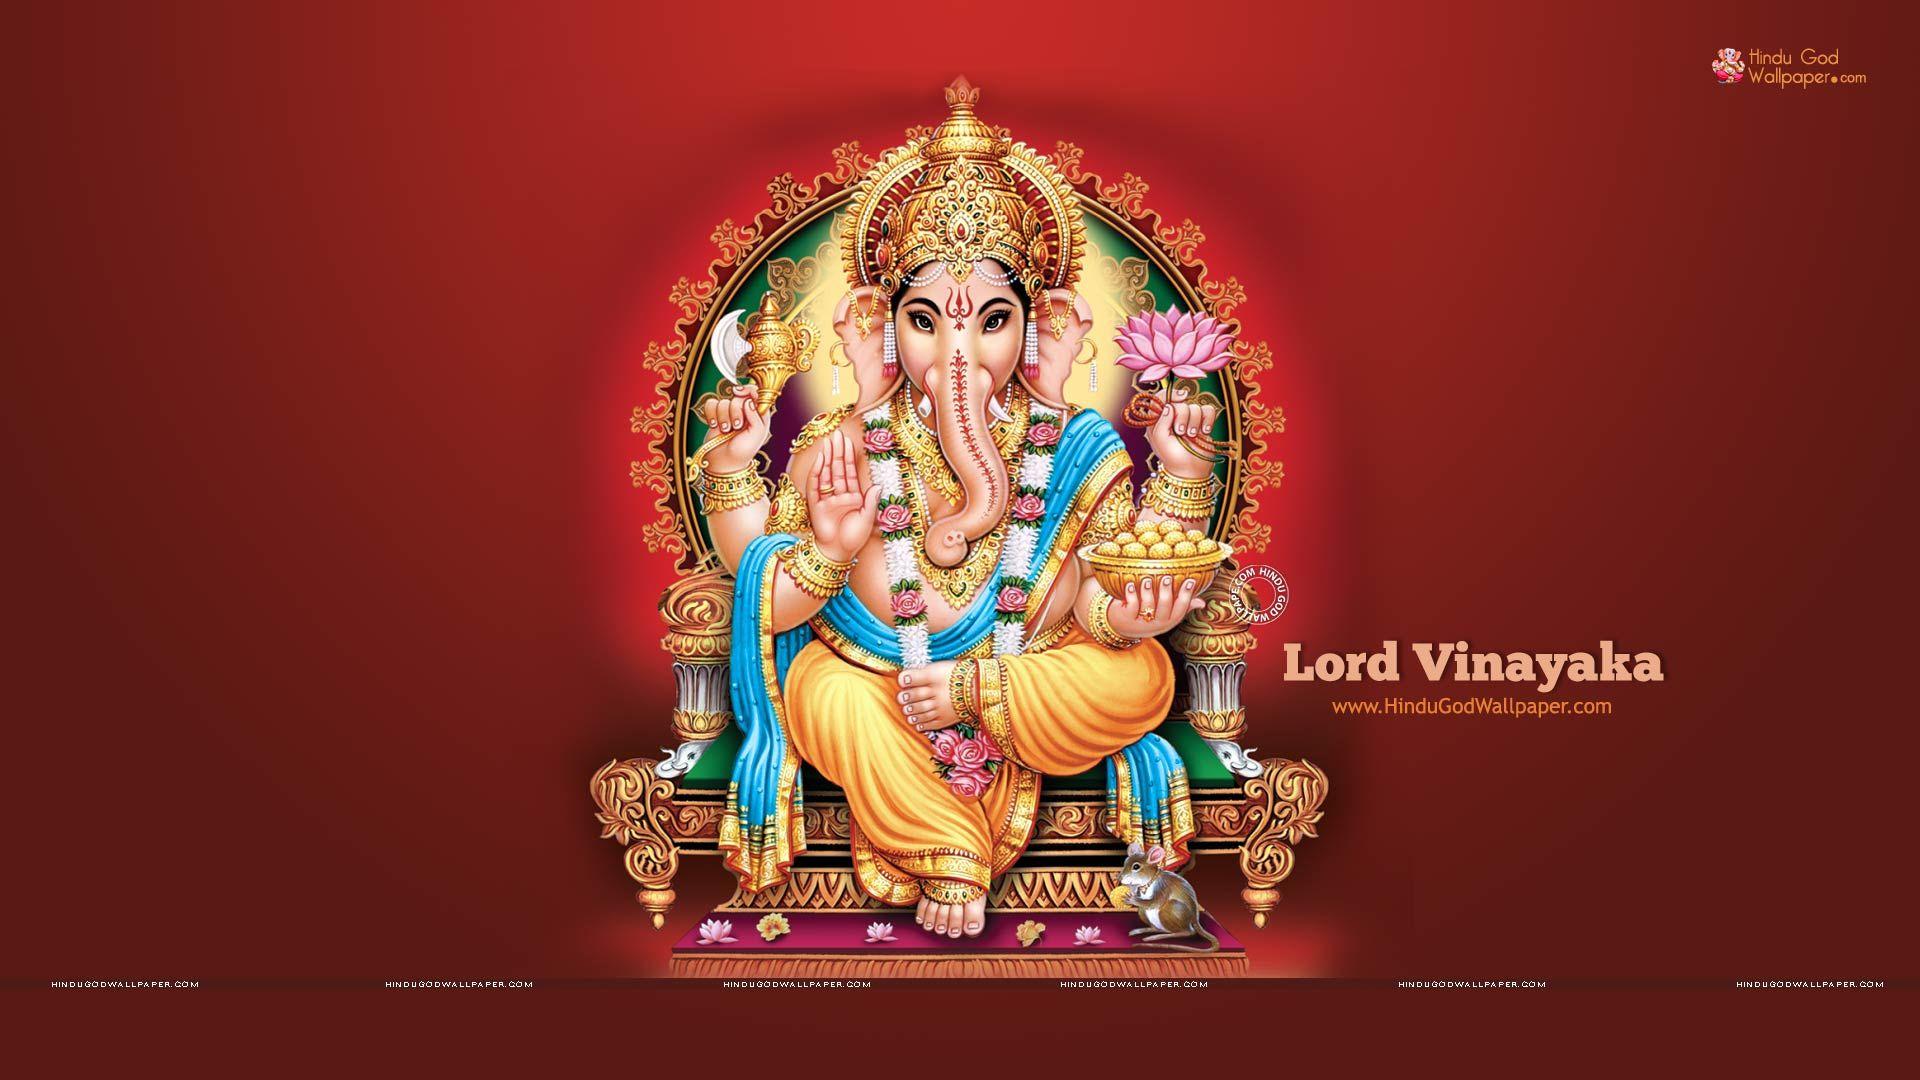 1080p Lord Vinayaka Hd Wallpaper Full Size Download Hd Wallpapers 1080p Hd Wallpaper Hindu Gods